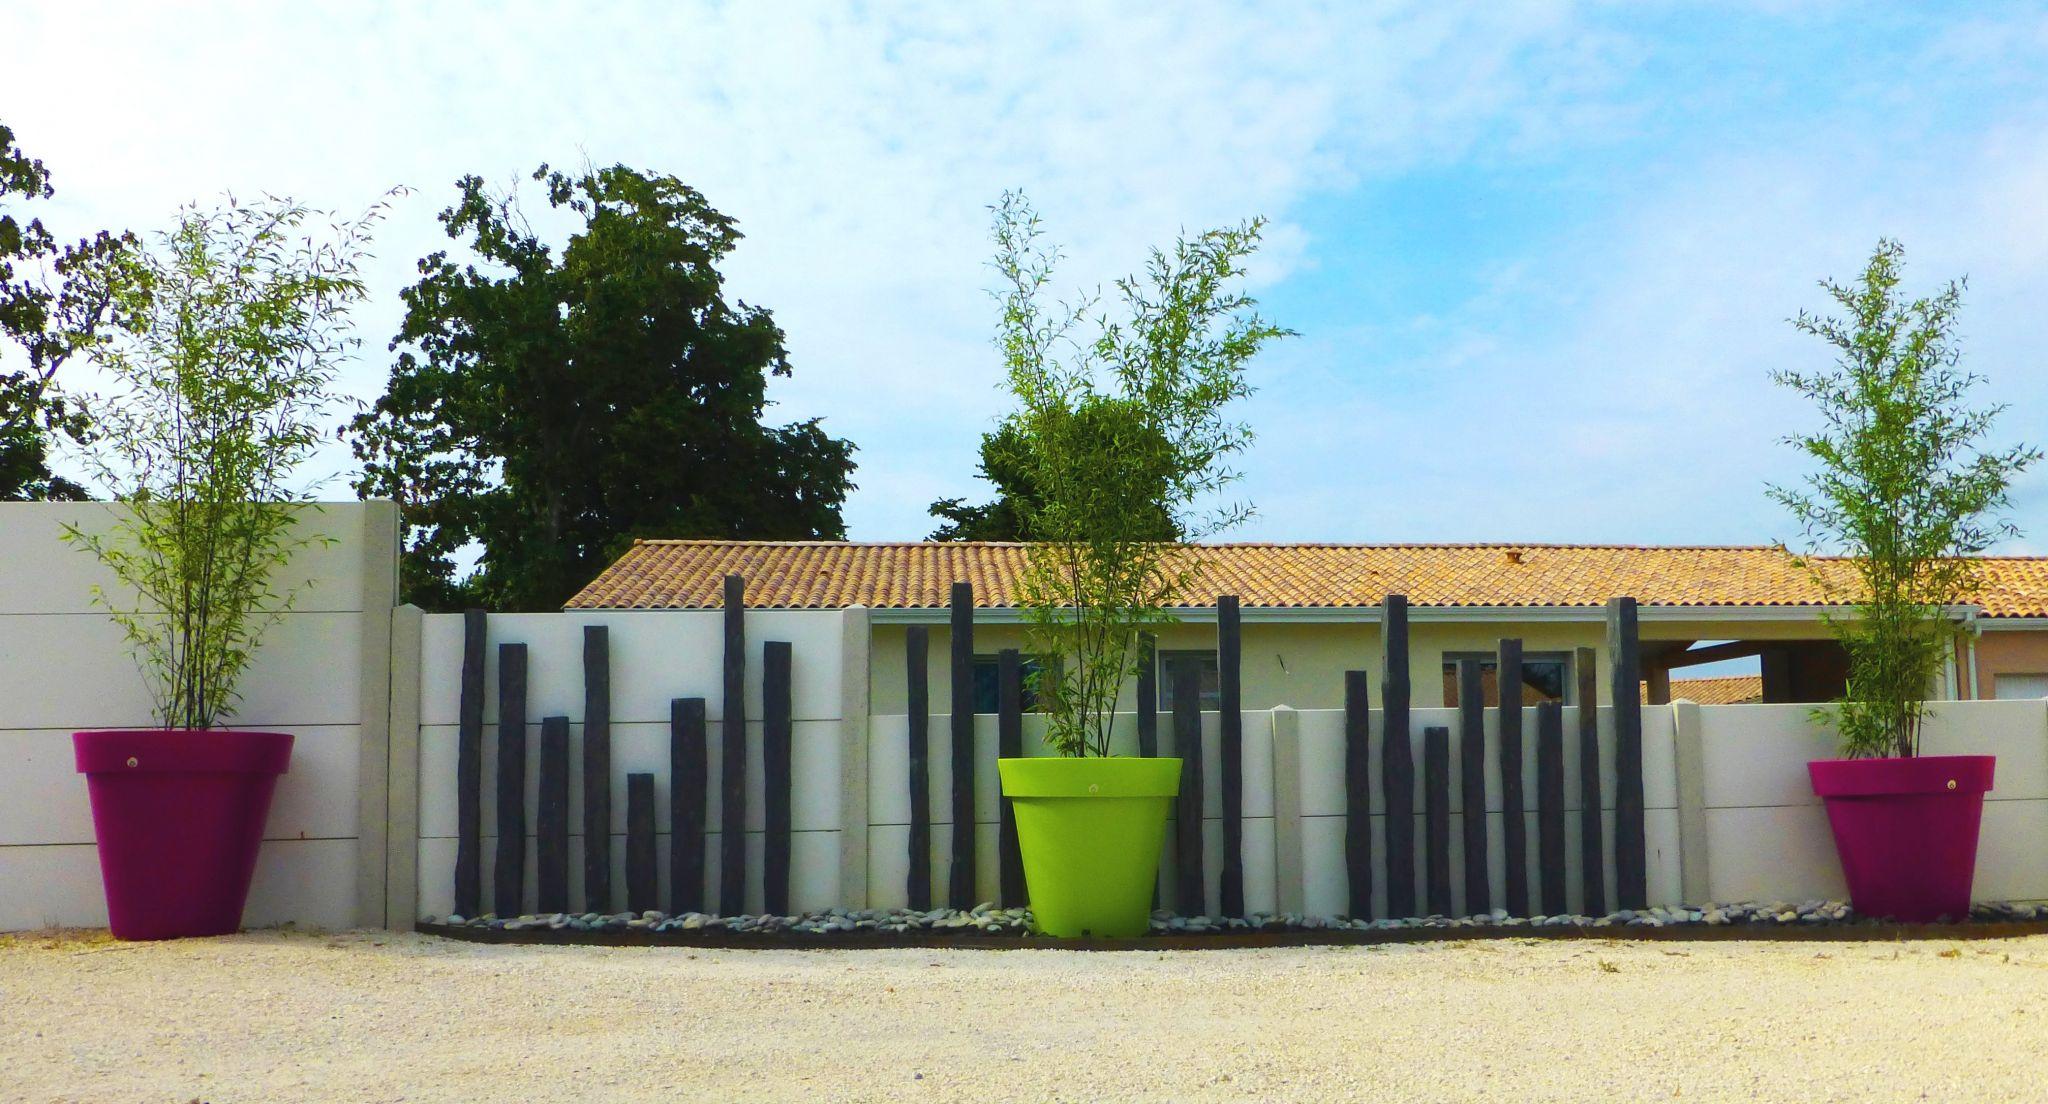 Puyau Paysagiste Gironde Décorations